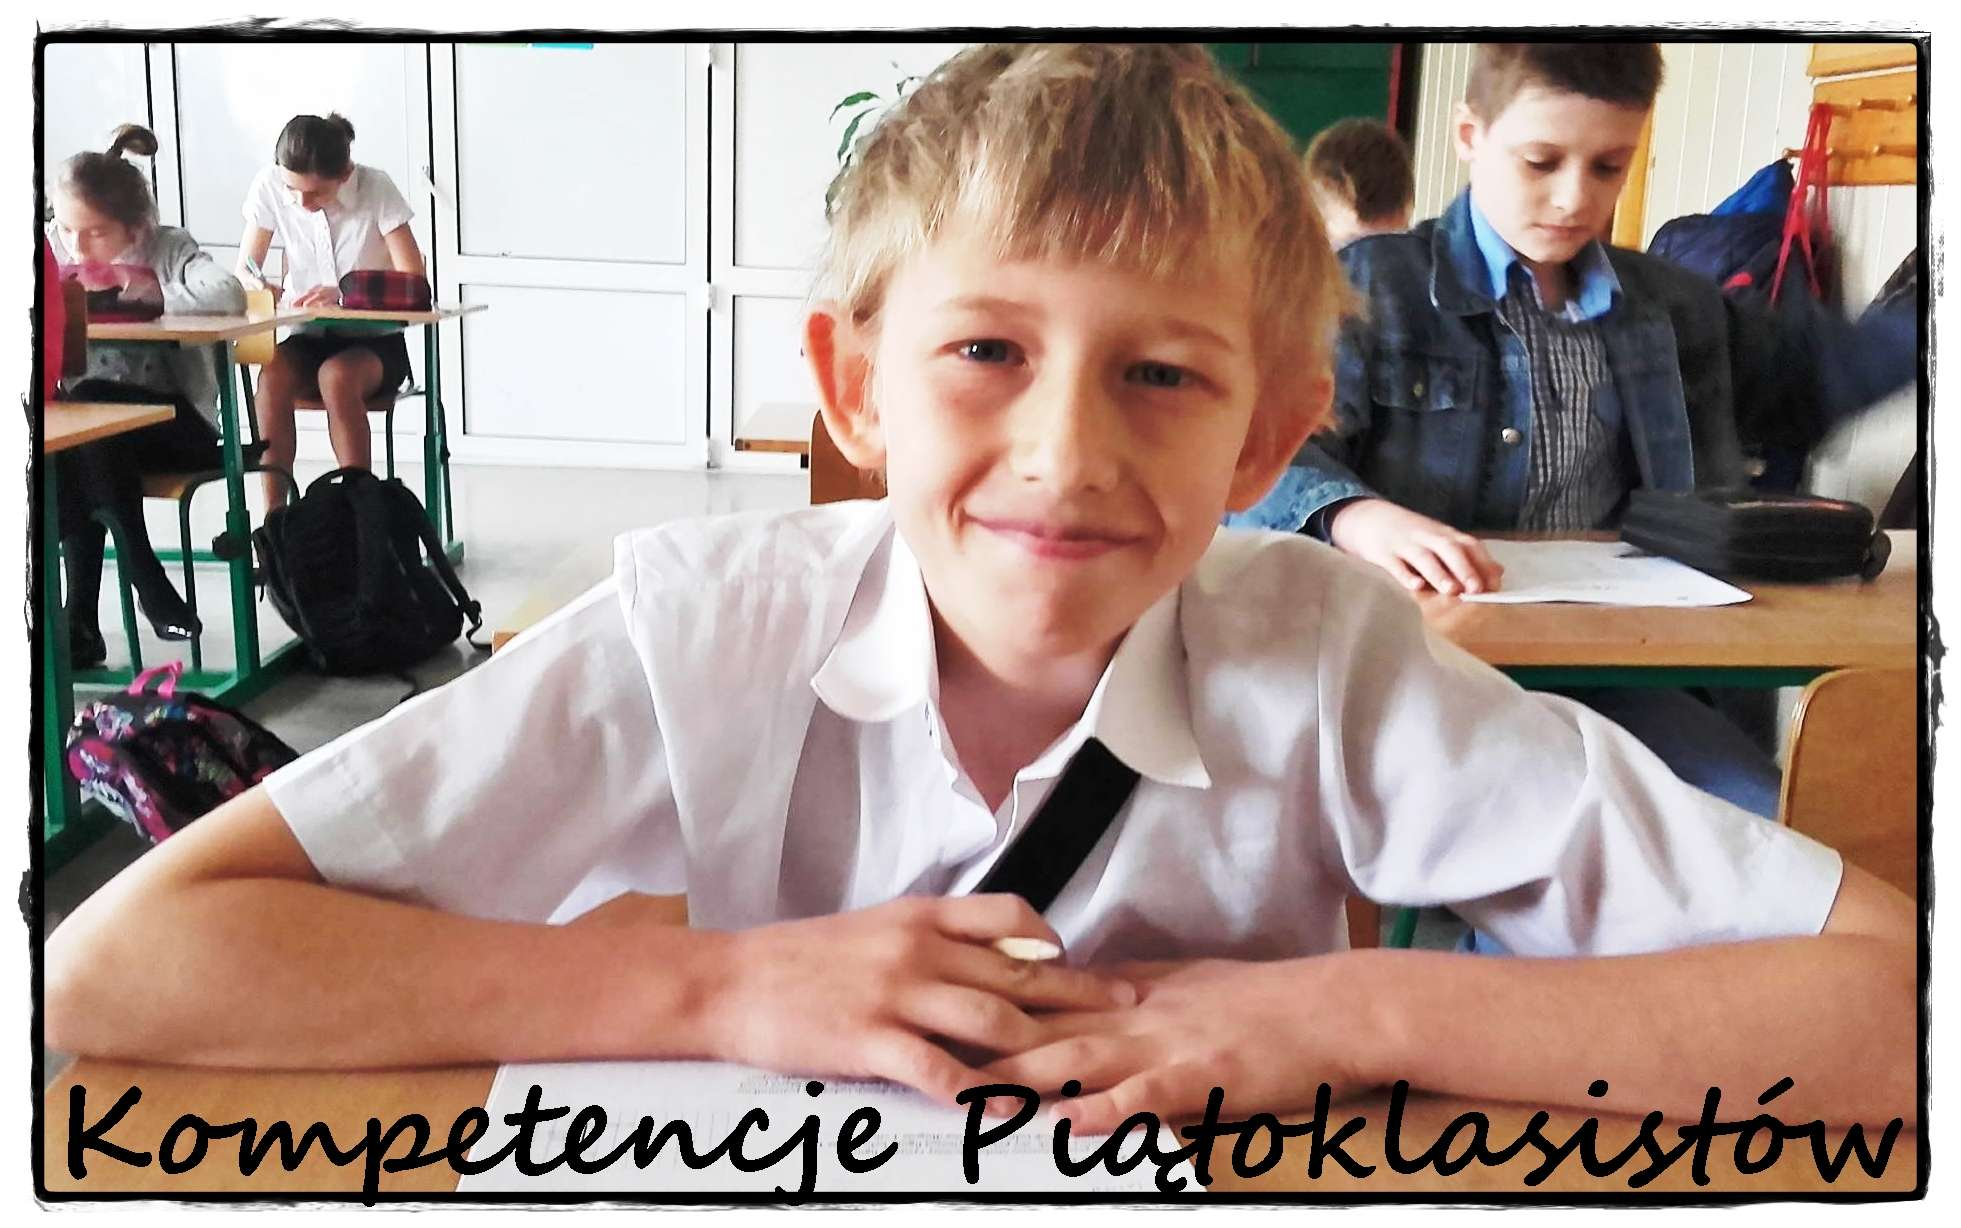 Kompetencje Piątoklasistów – K52016